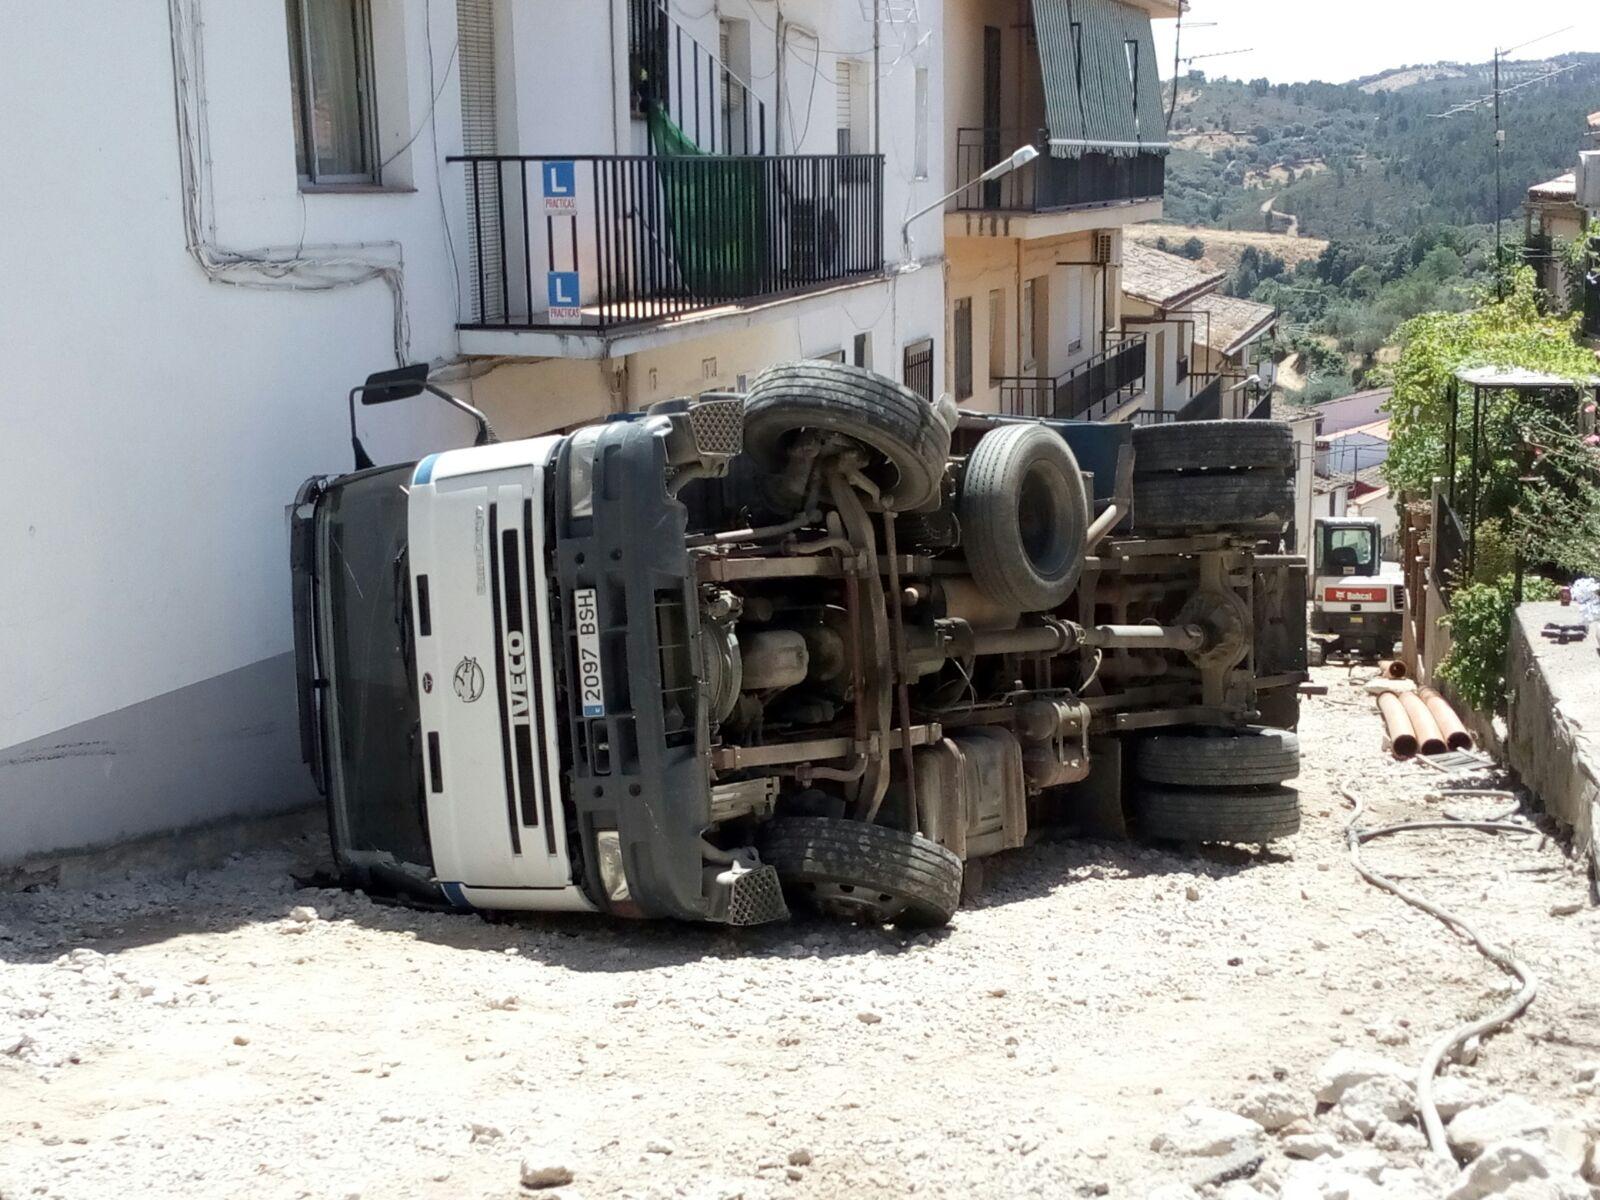 Vuelca un camión agosto 2018 - Guadalupe 1